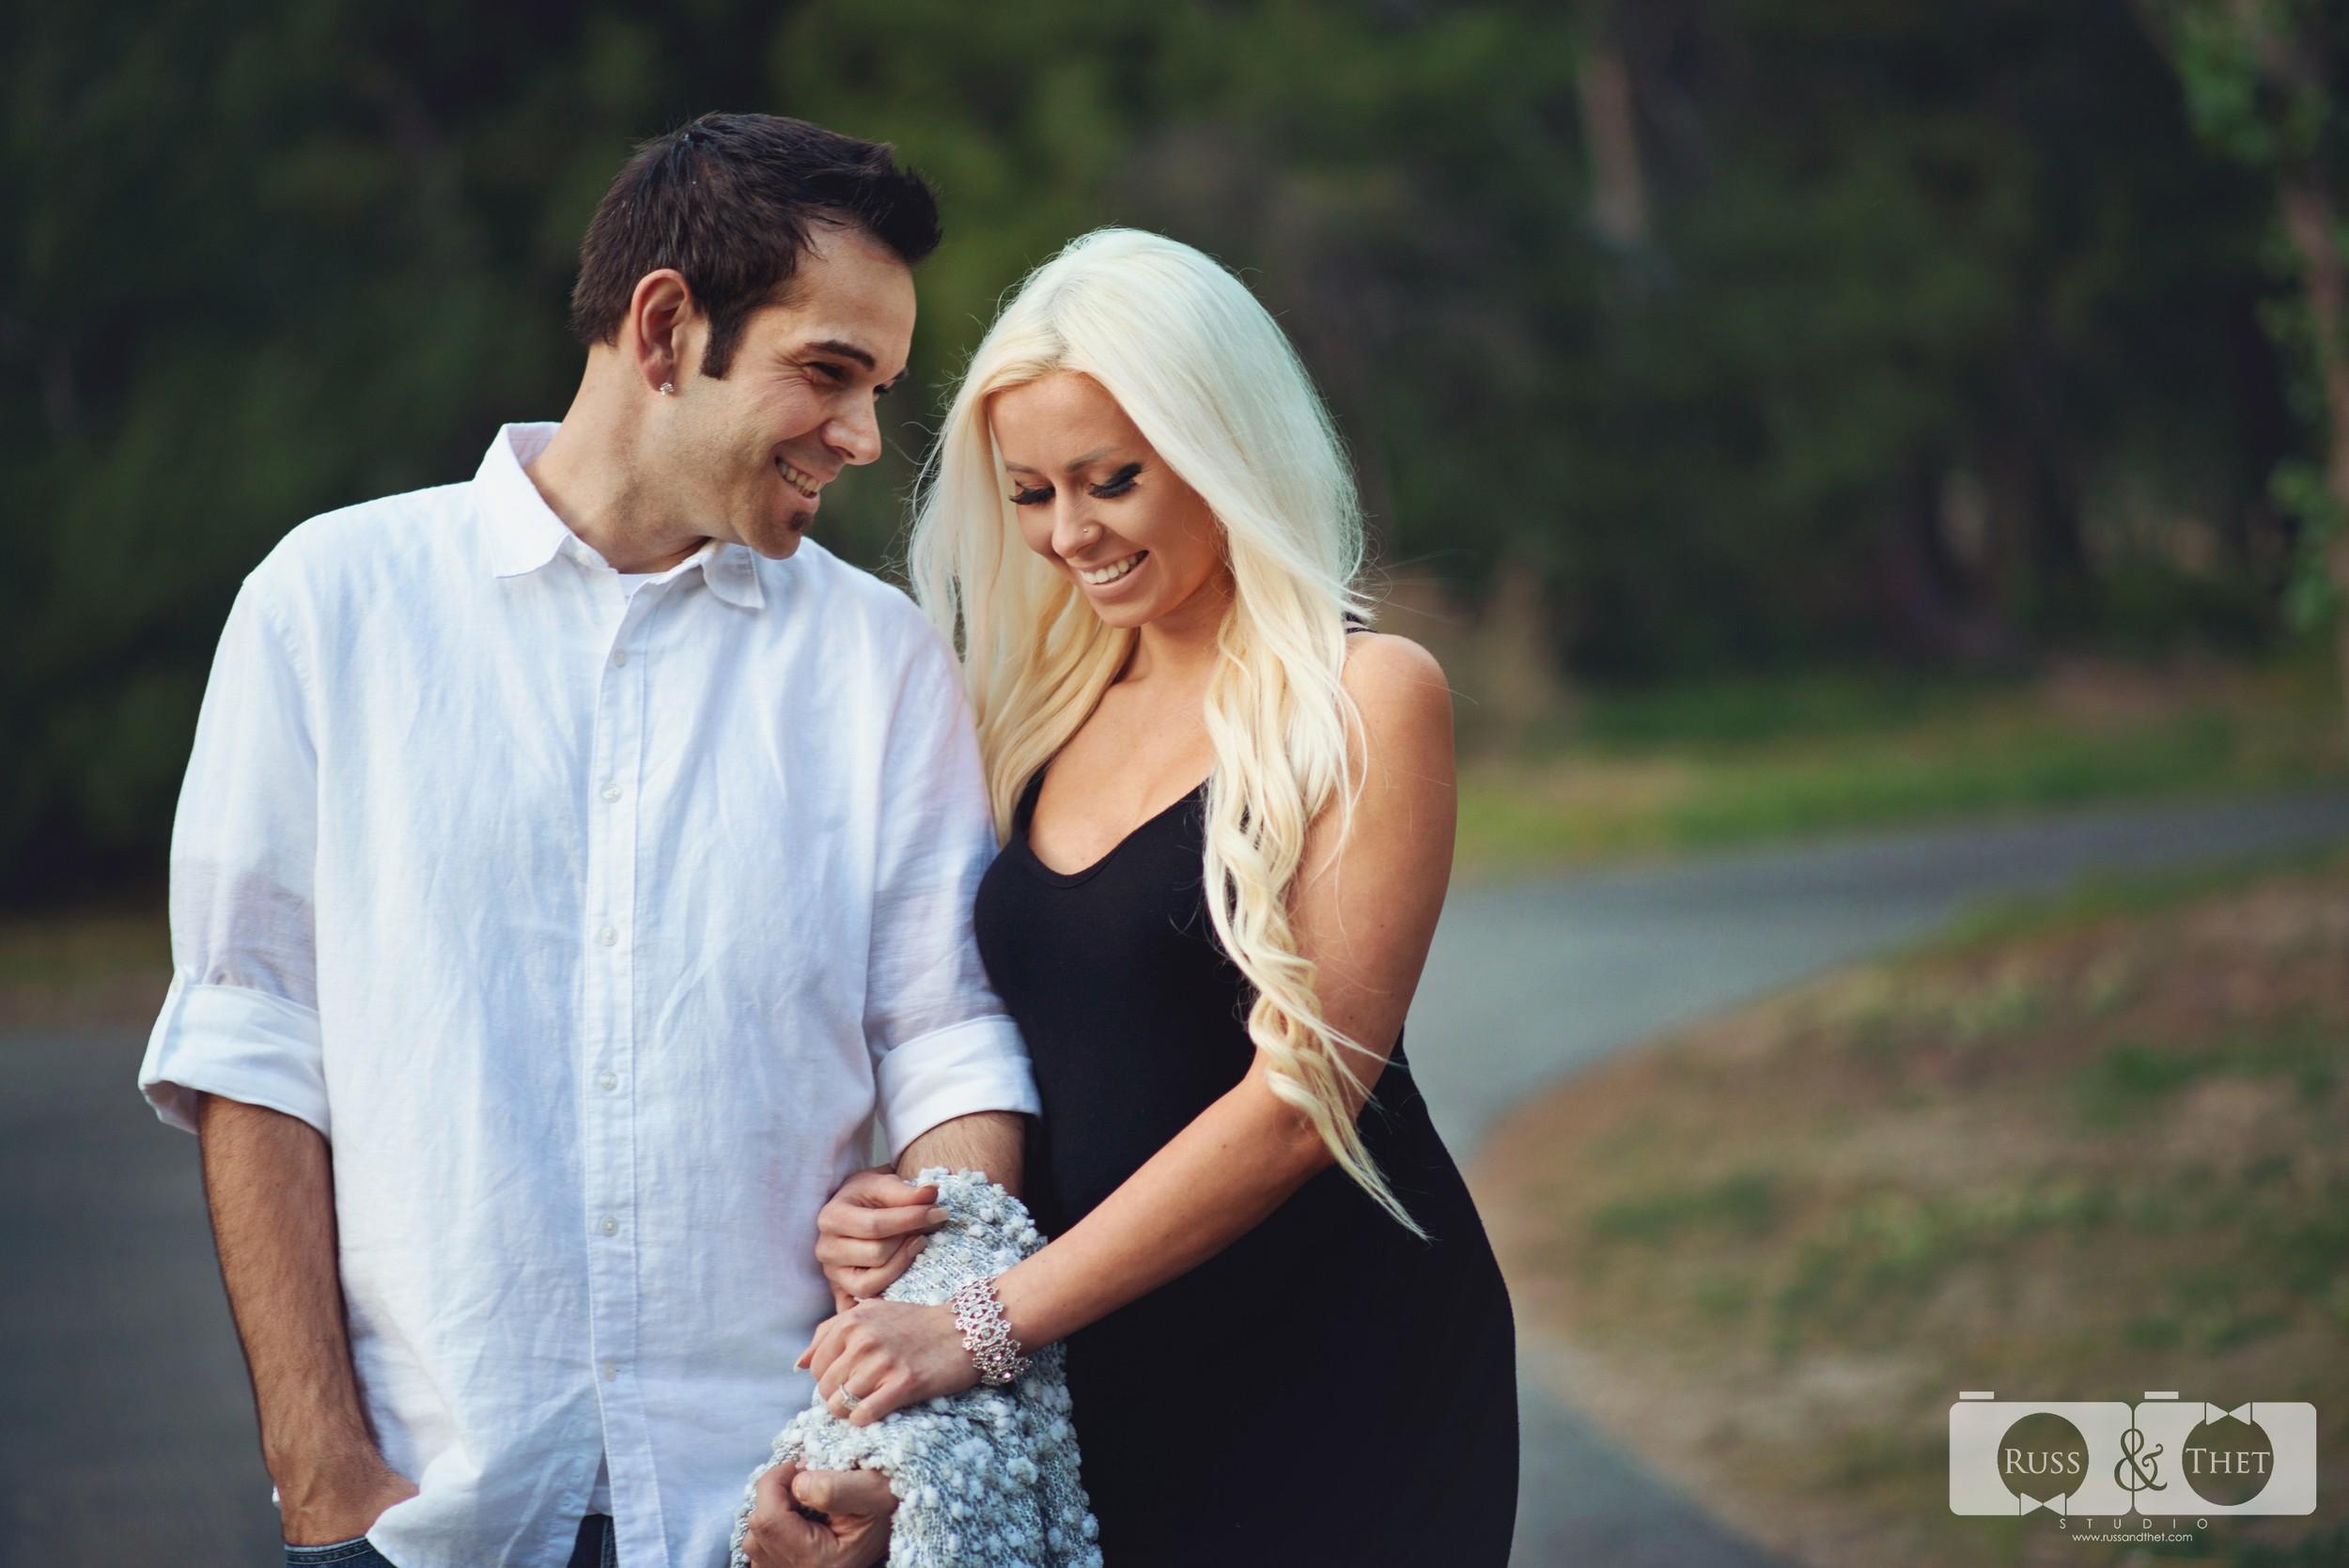 Jon&Kimee-Orange-County-Engagement-Photographer (11).jpg